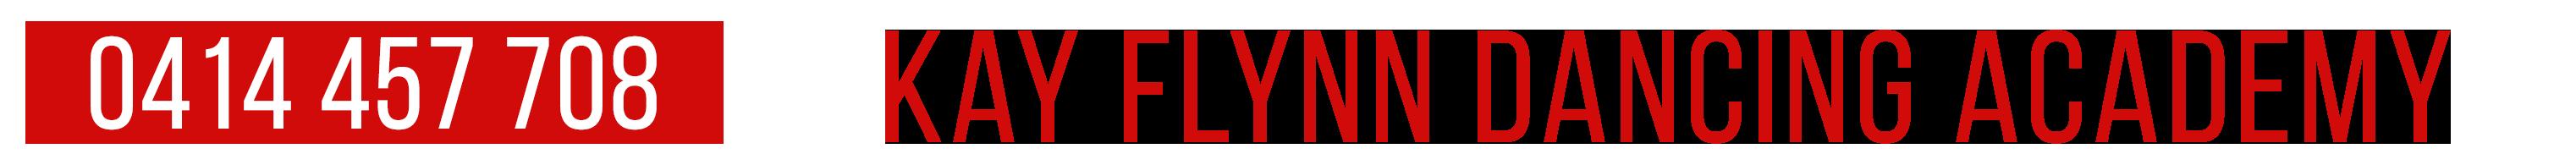 Kay Flynn Dancing Academy